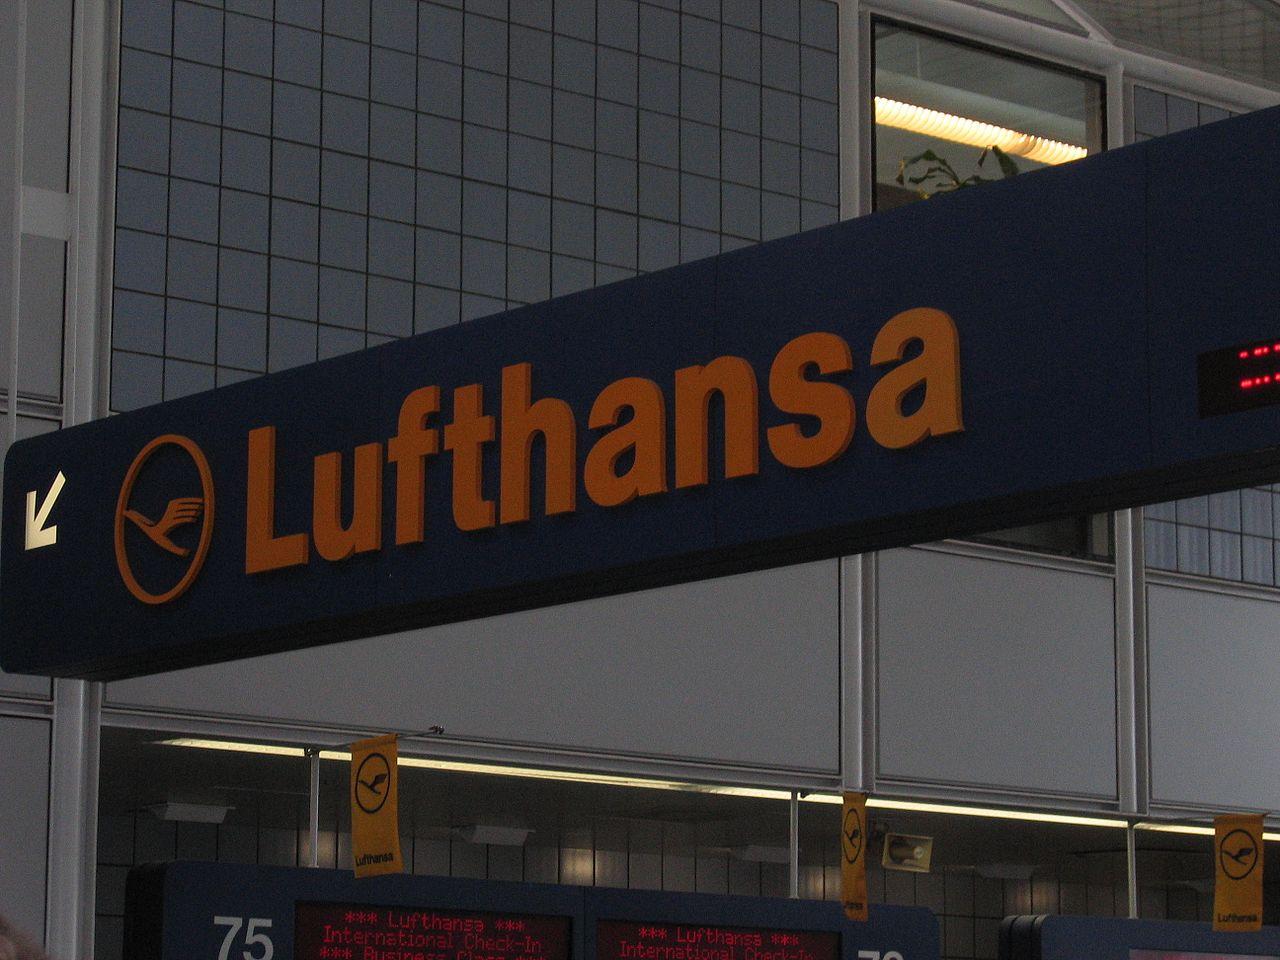 Lufthansa logo at O'Hare.jpg